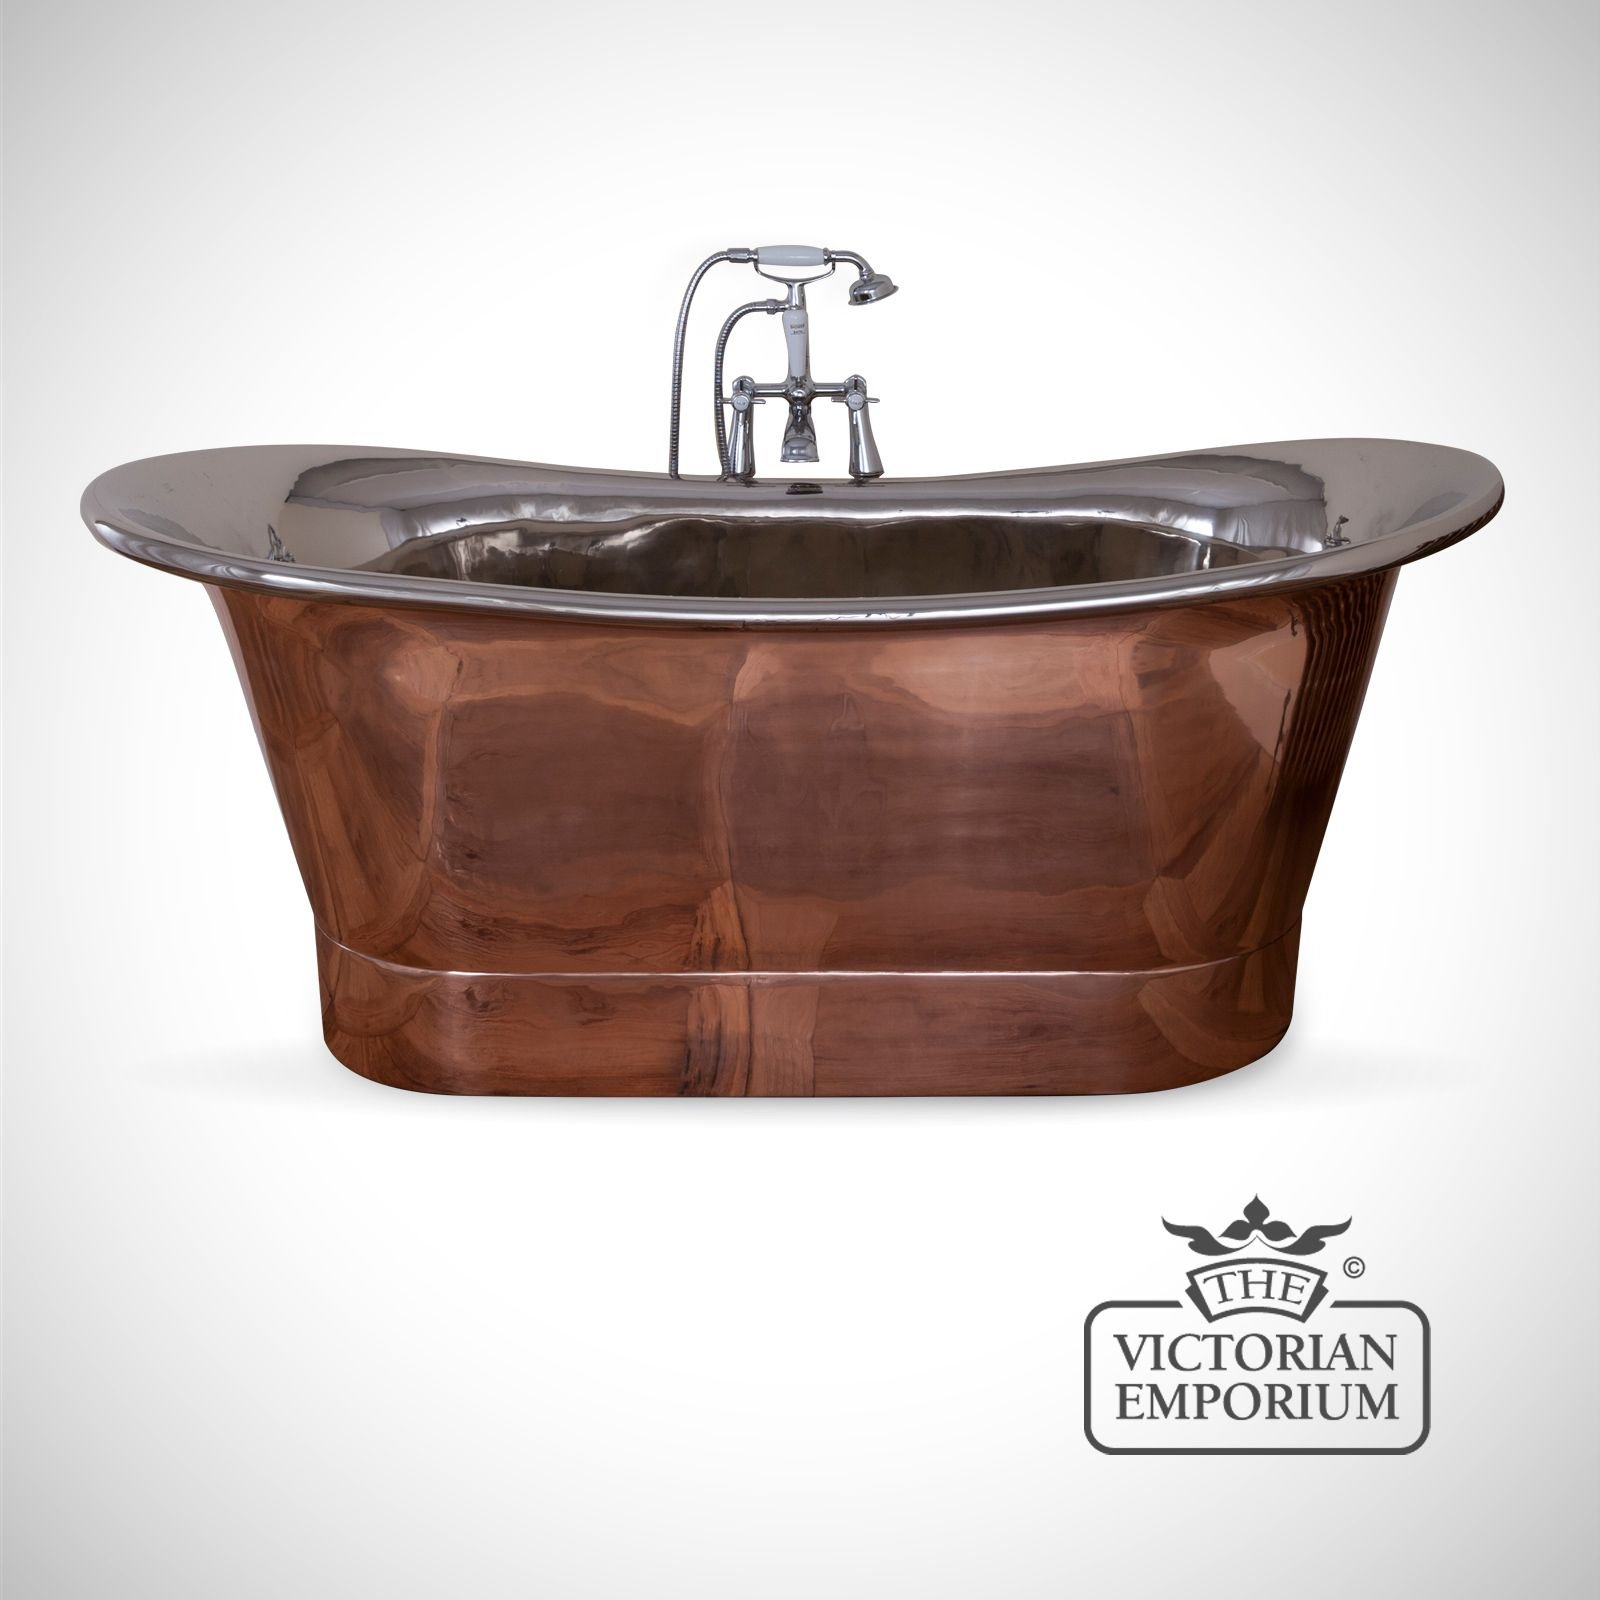 Normandie Copper and Nickel Bath | Baths